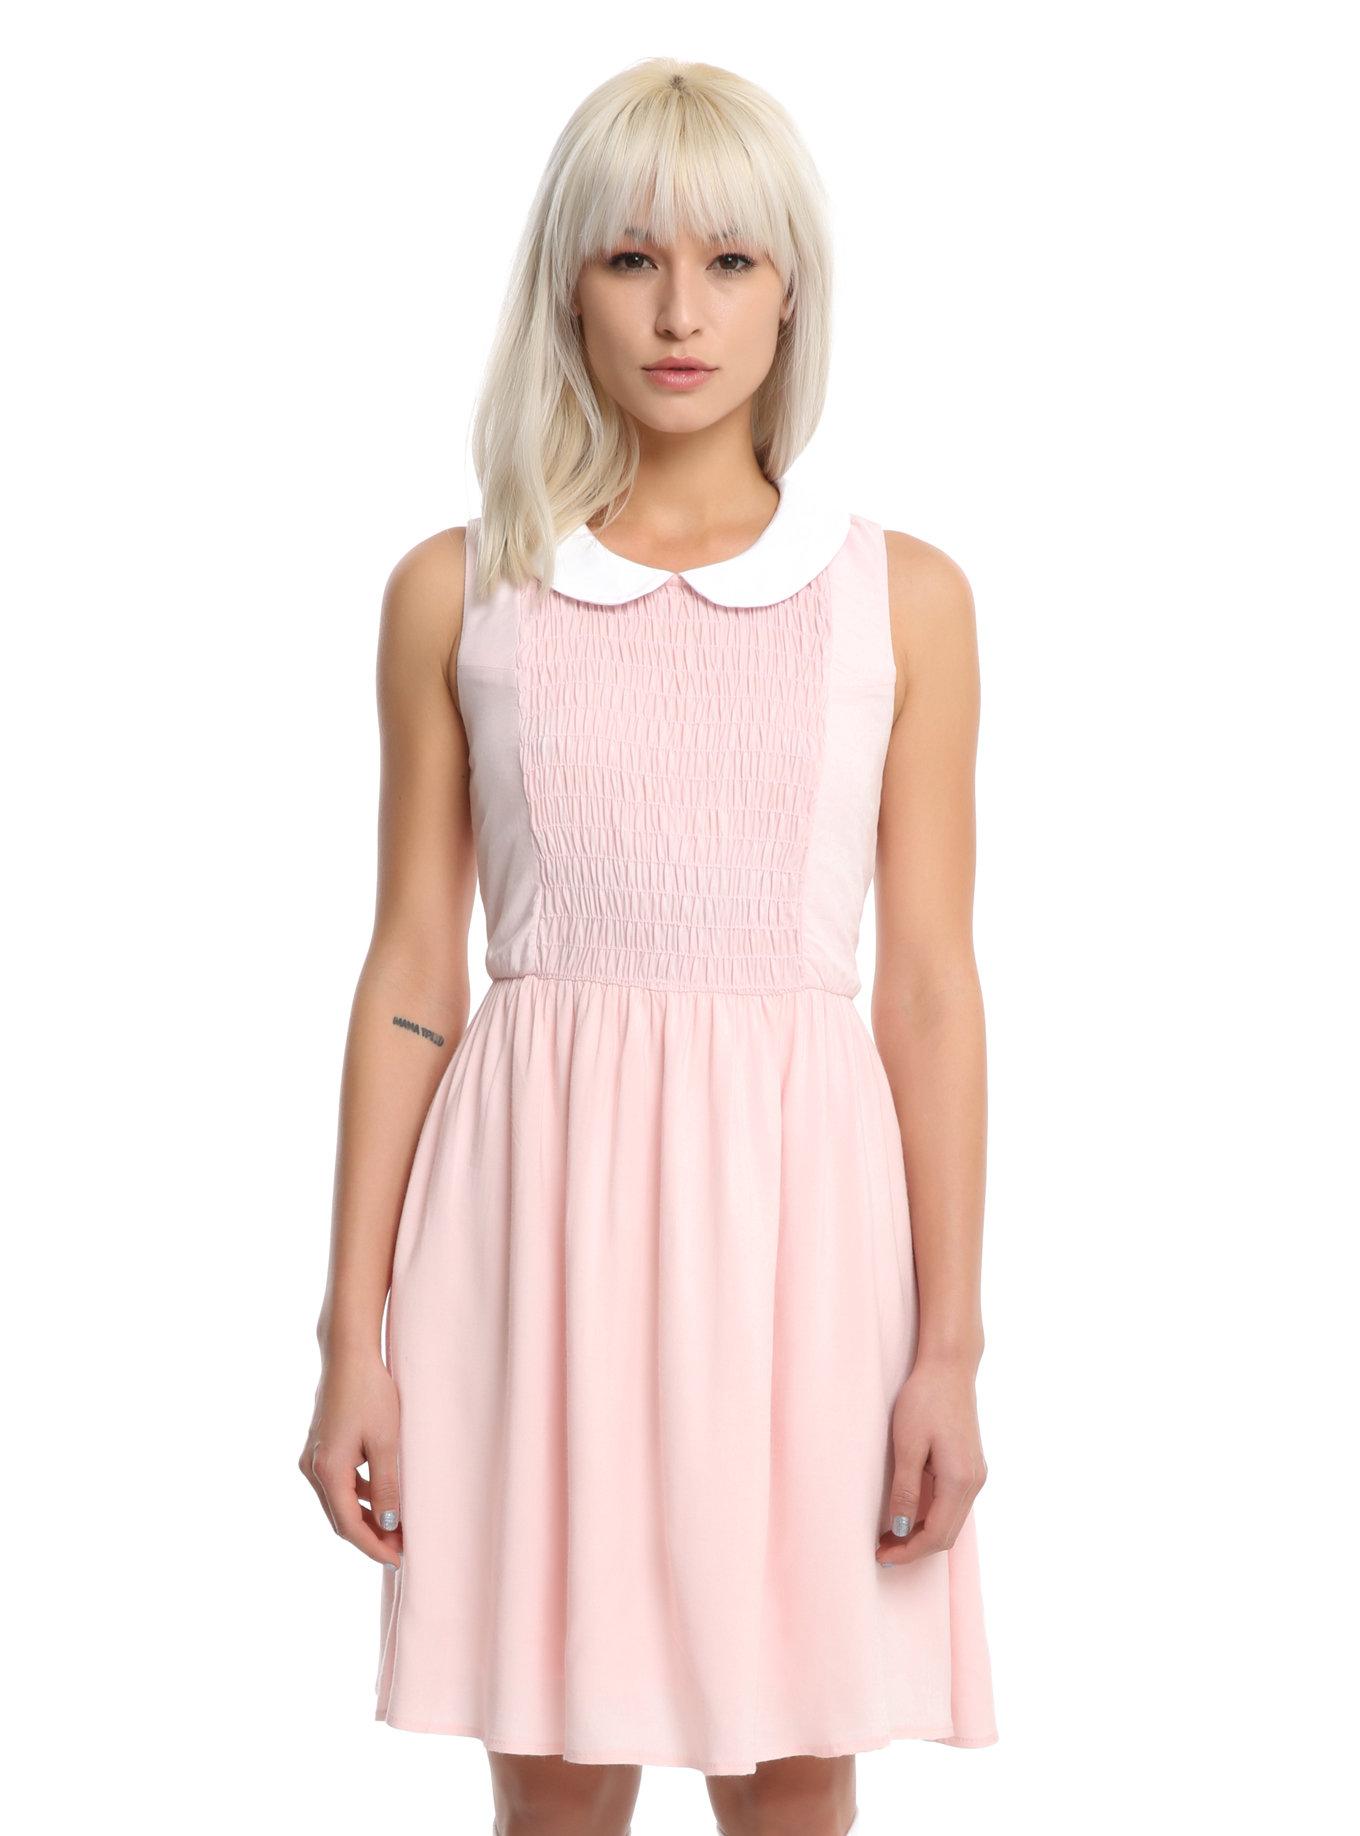 eleven blush dress